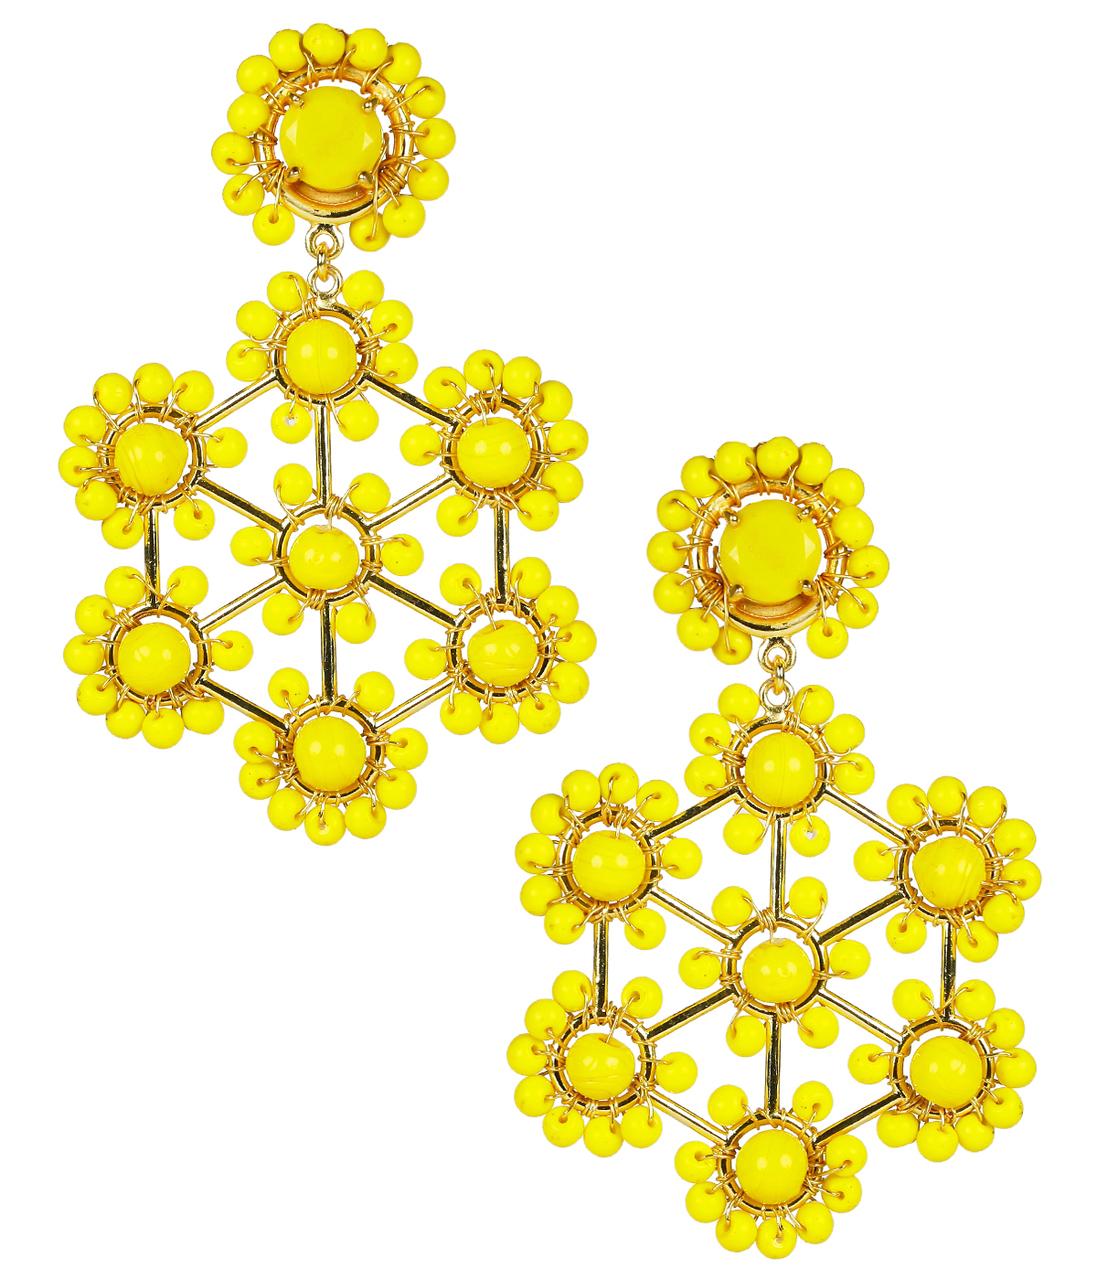 Vivi Yellow Earrings by LISI LERCH